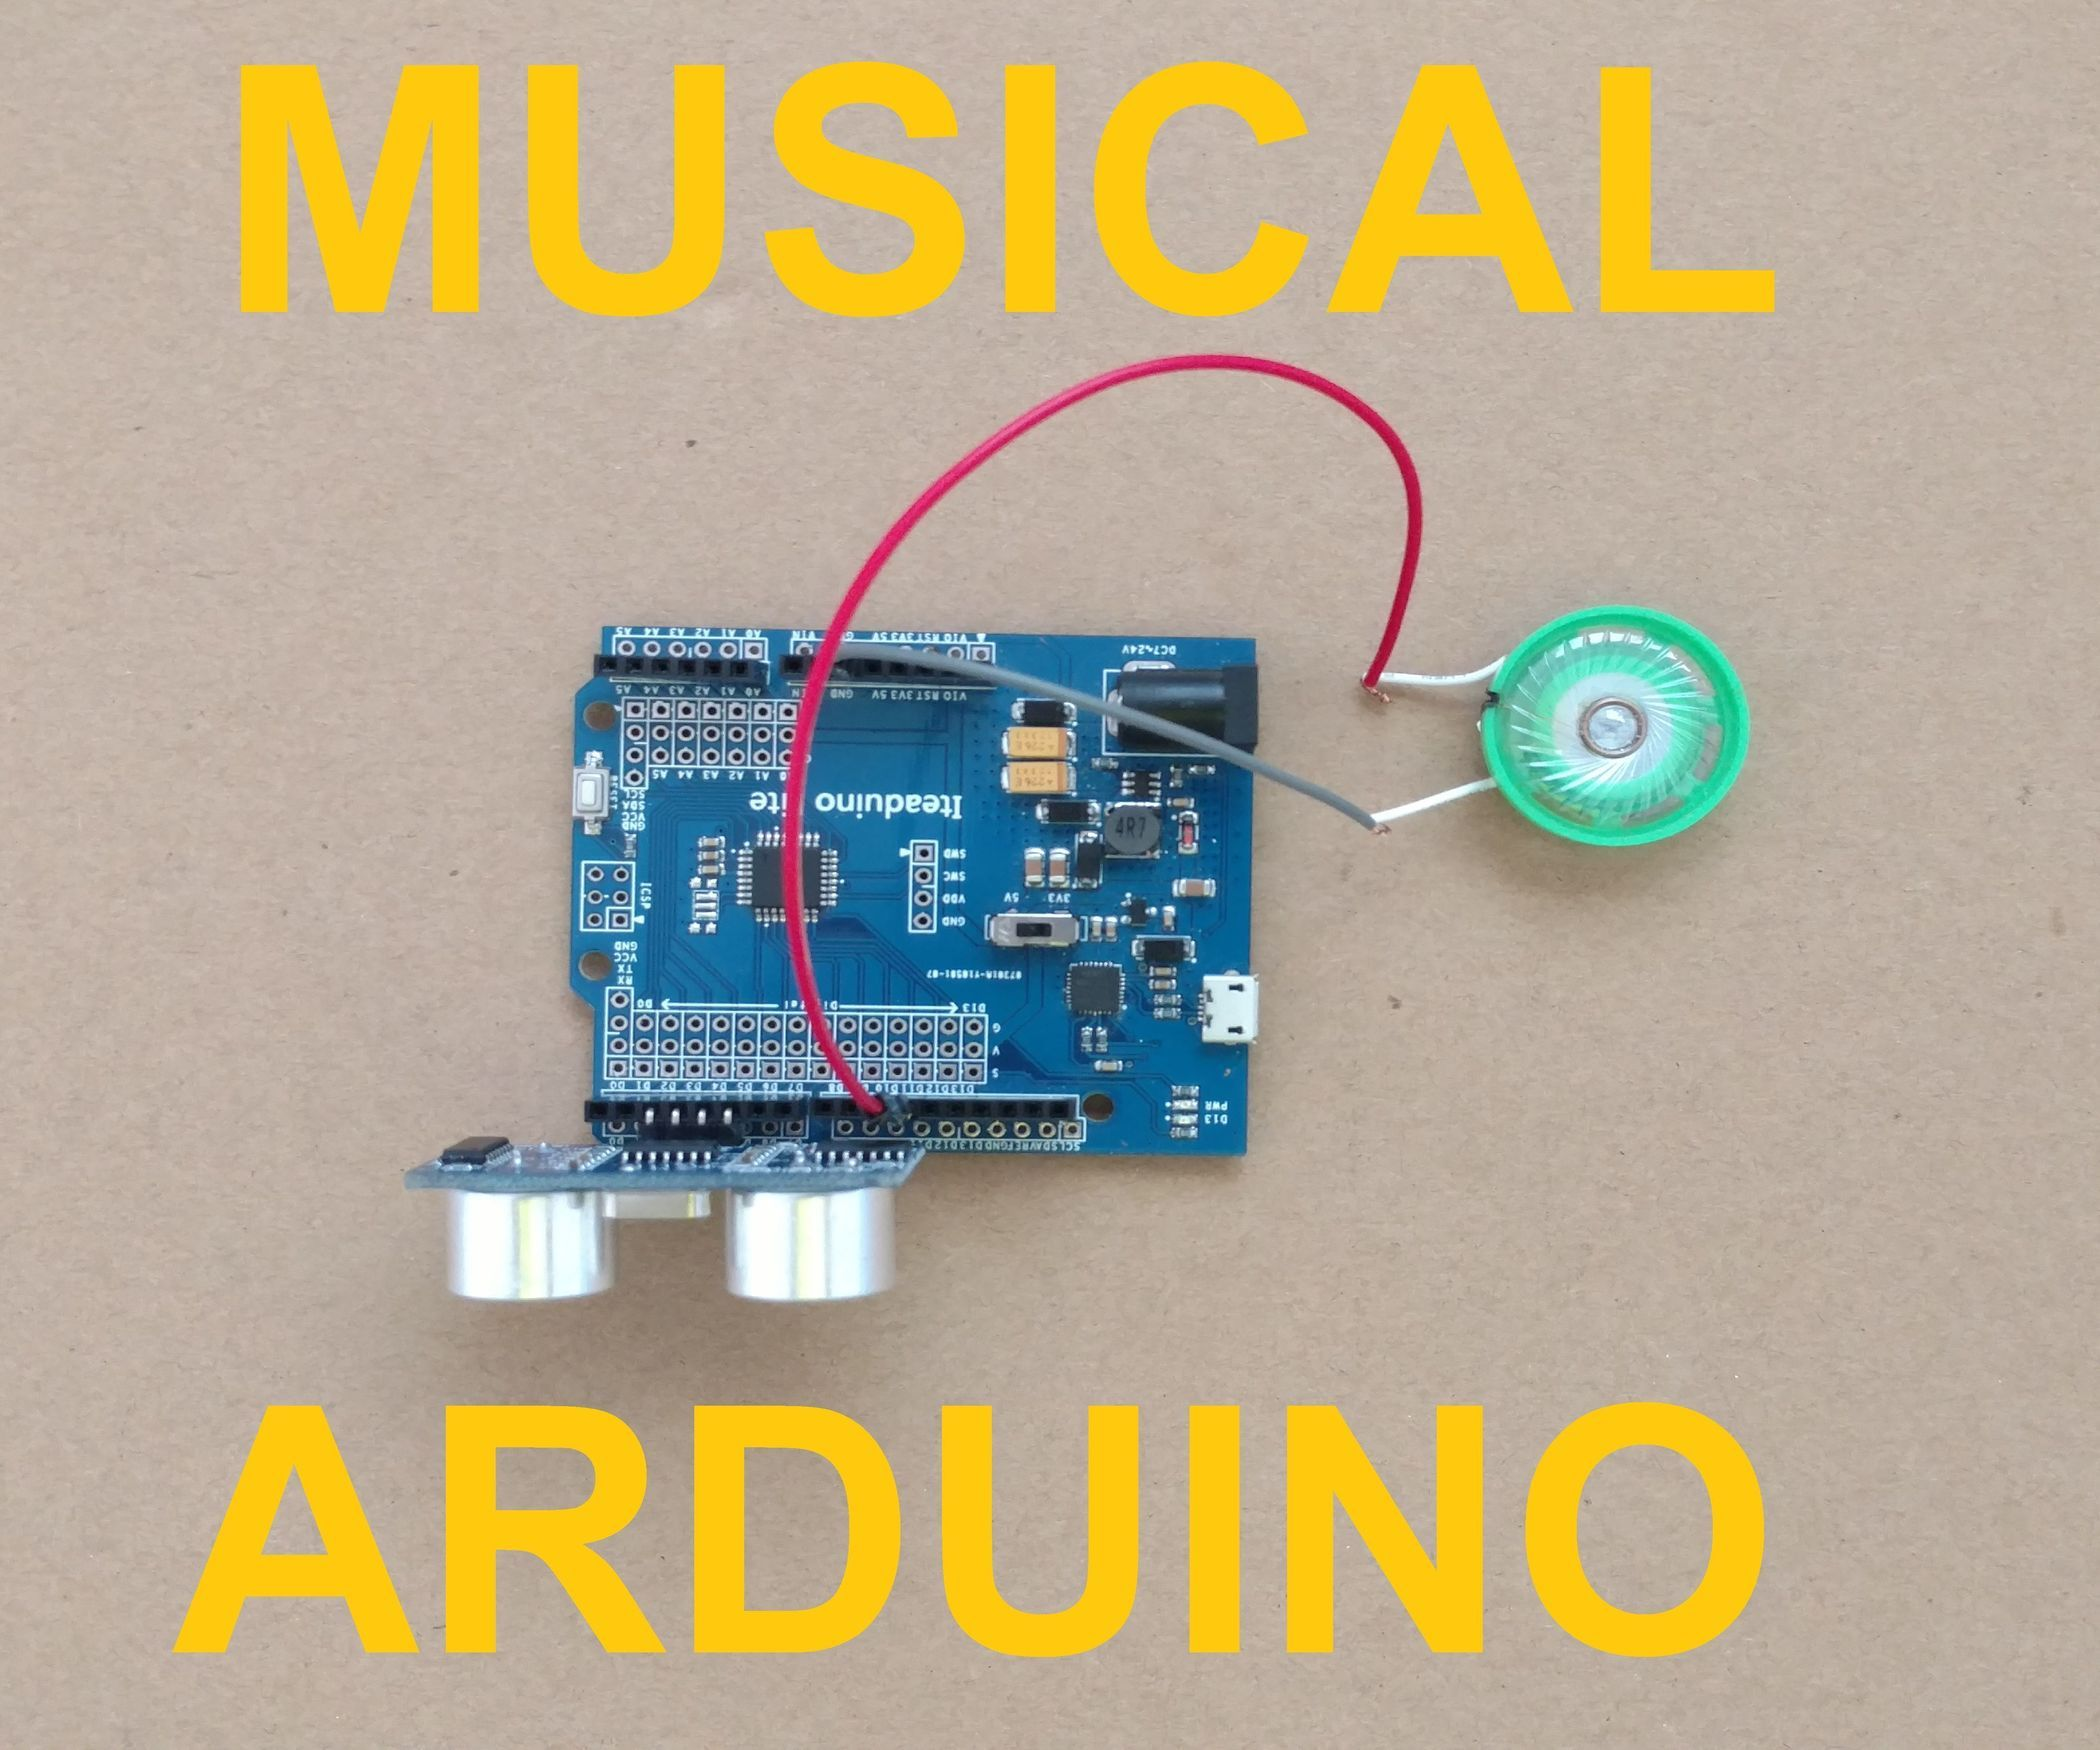 Musical Instrument Using Arduino + Ultrasonic Distance Sensor